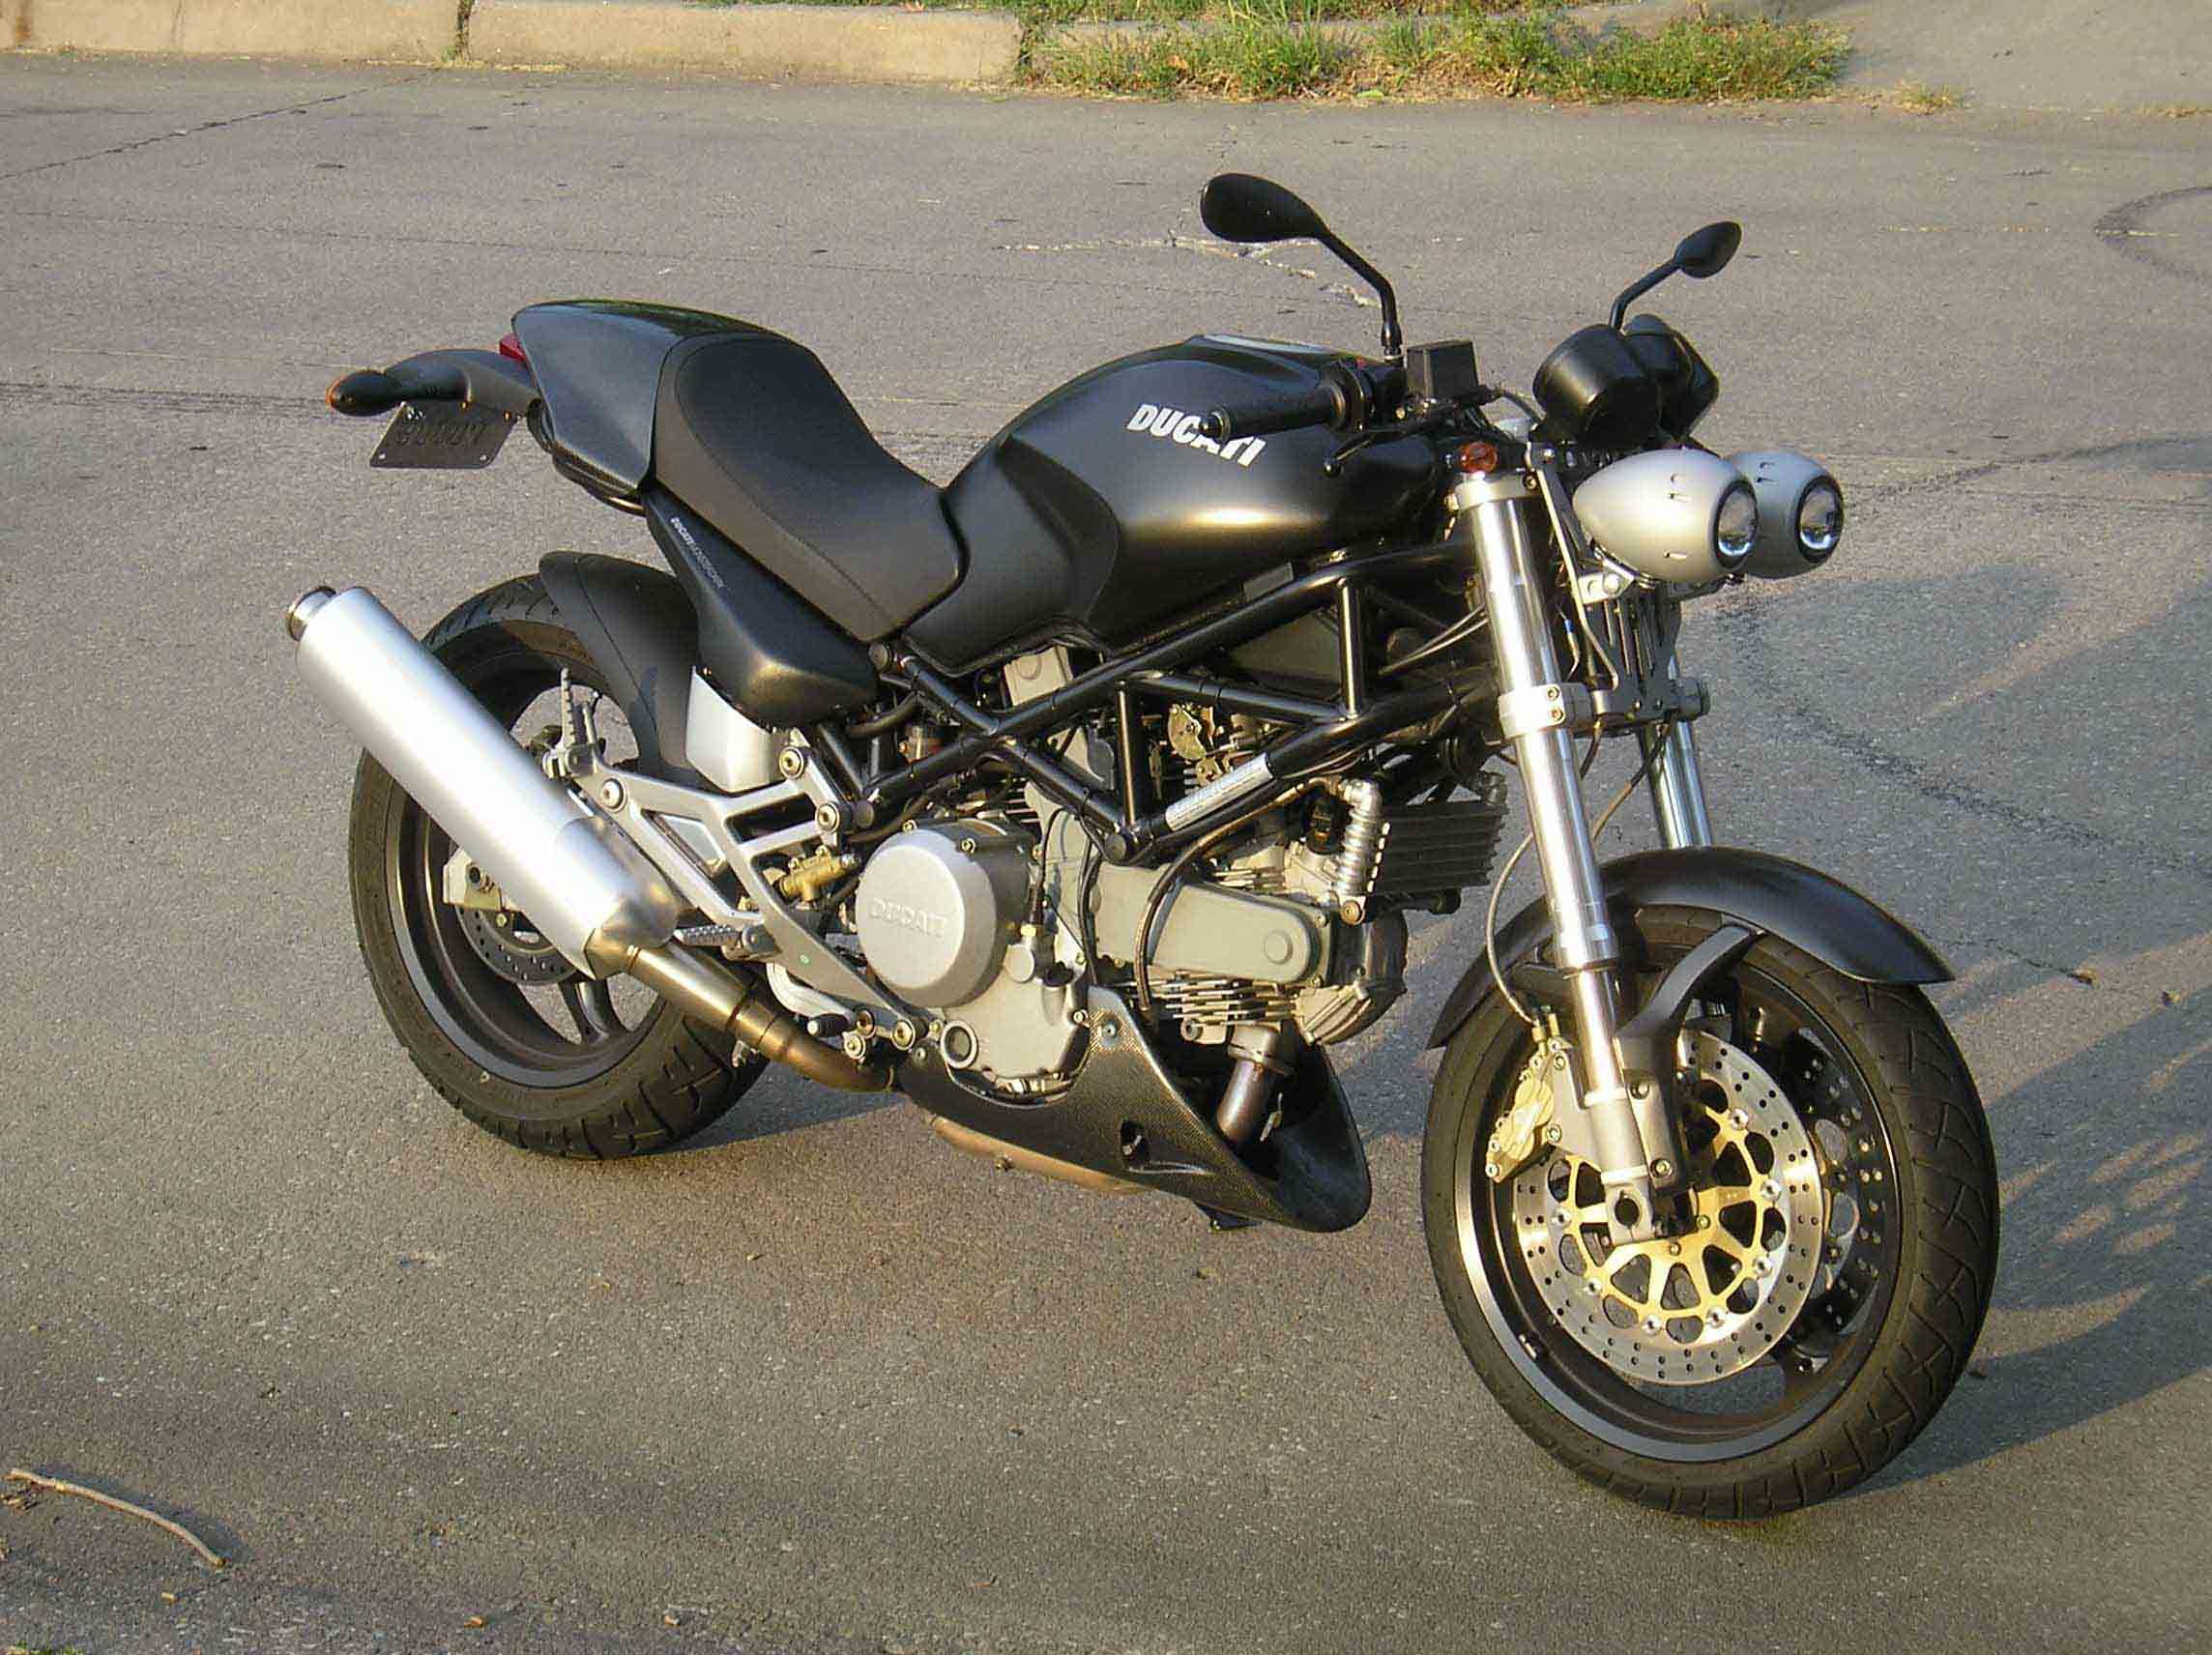 ducati parts from predator motorsport rh predatormotorsport co uk 2001 Ducati Monster 900 Review 2001 Ducati Monster Dark 748